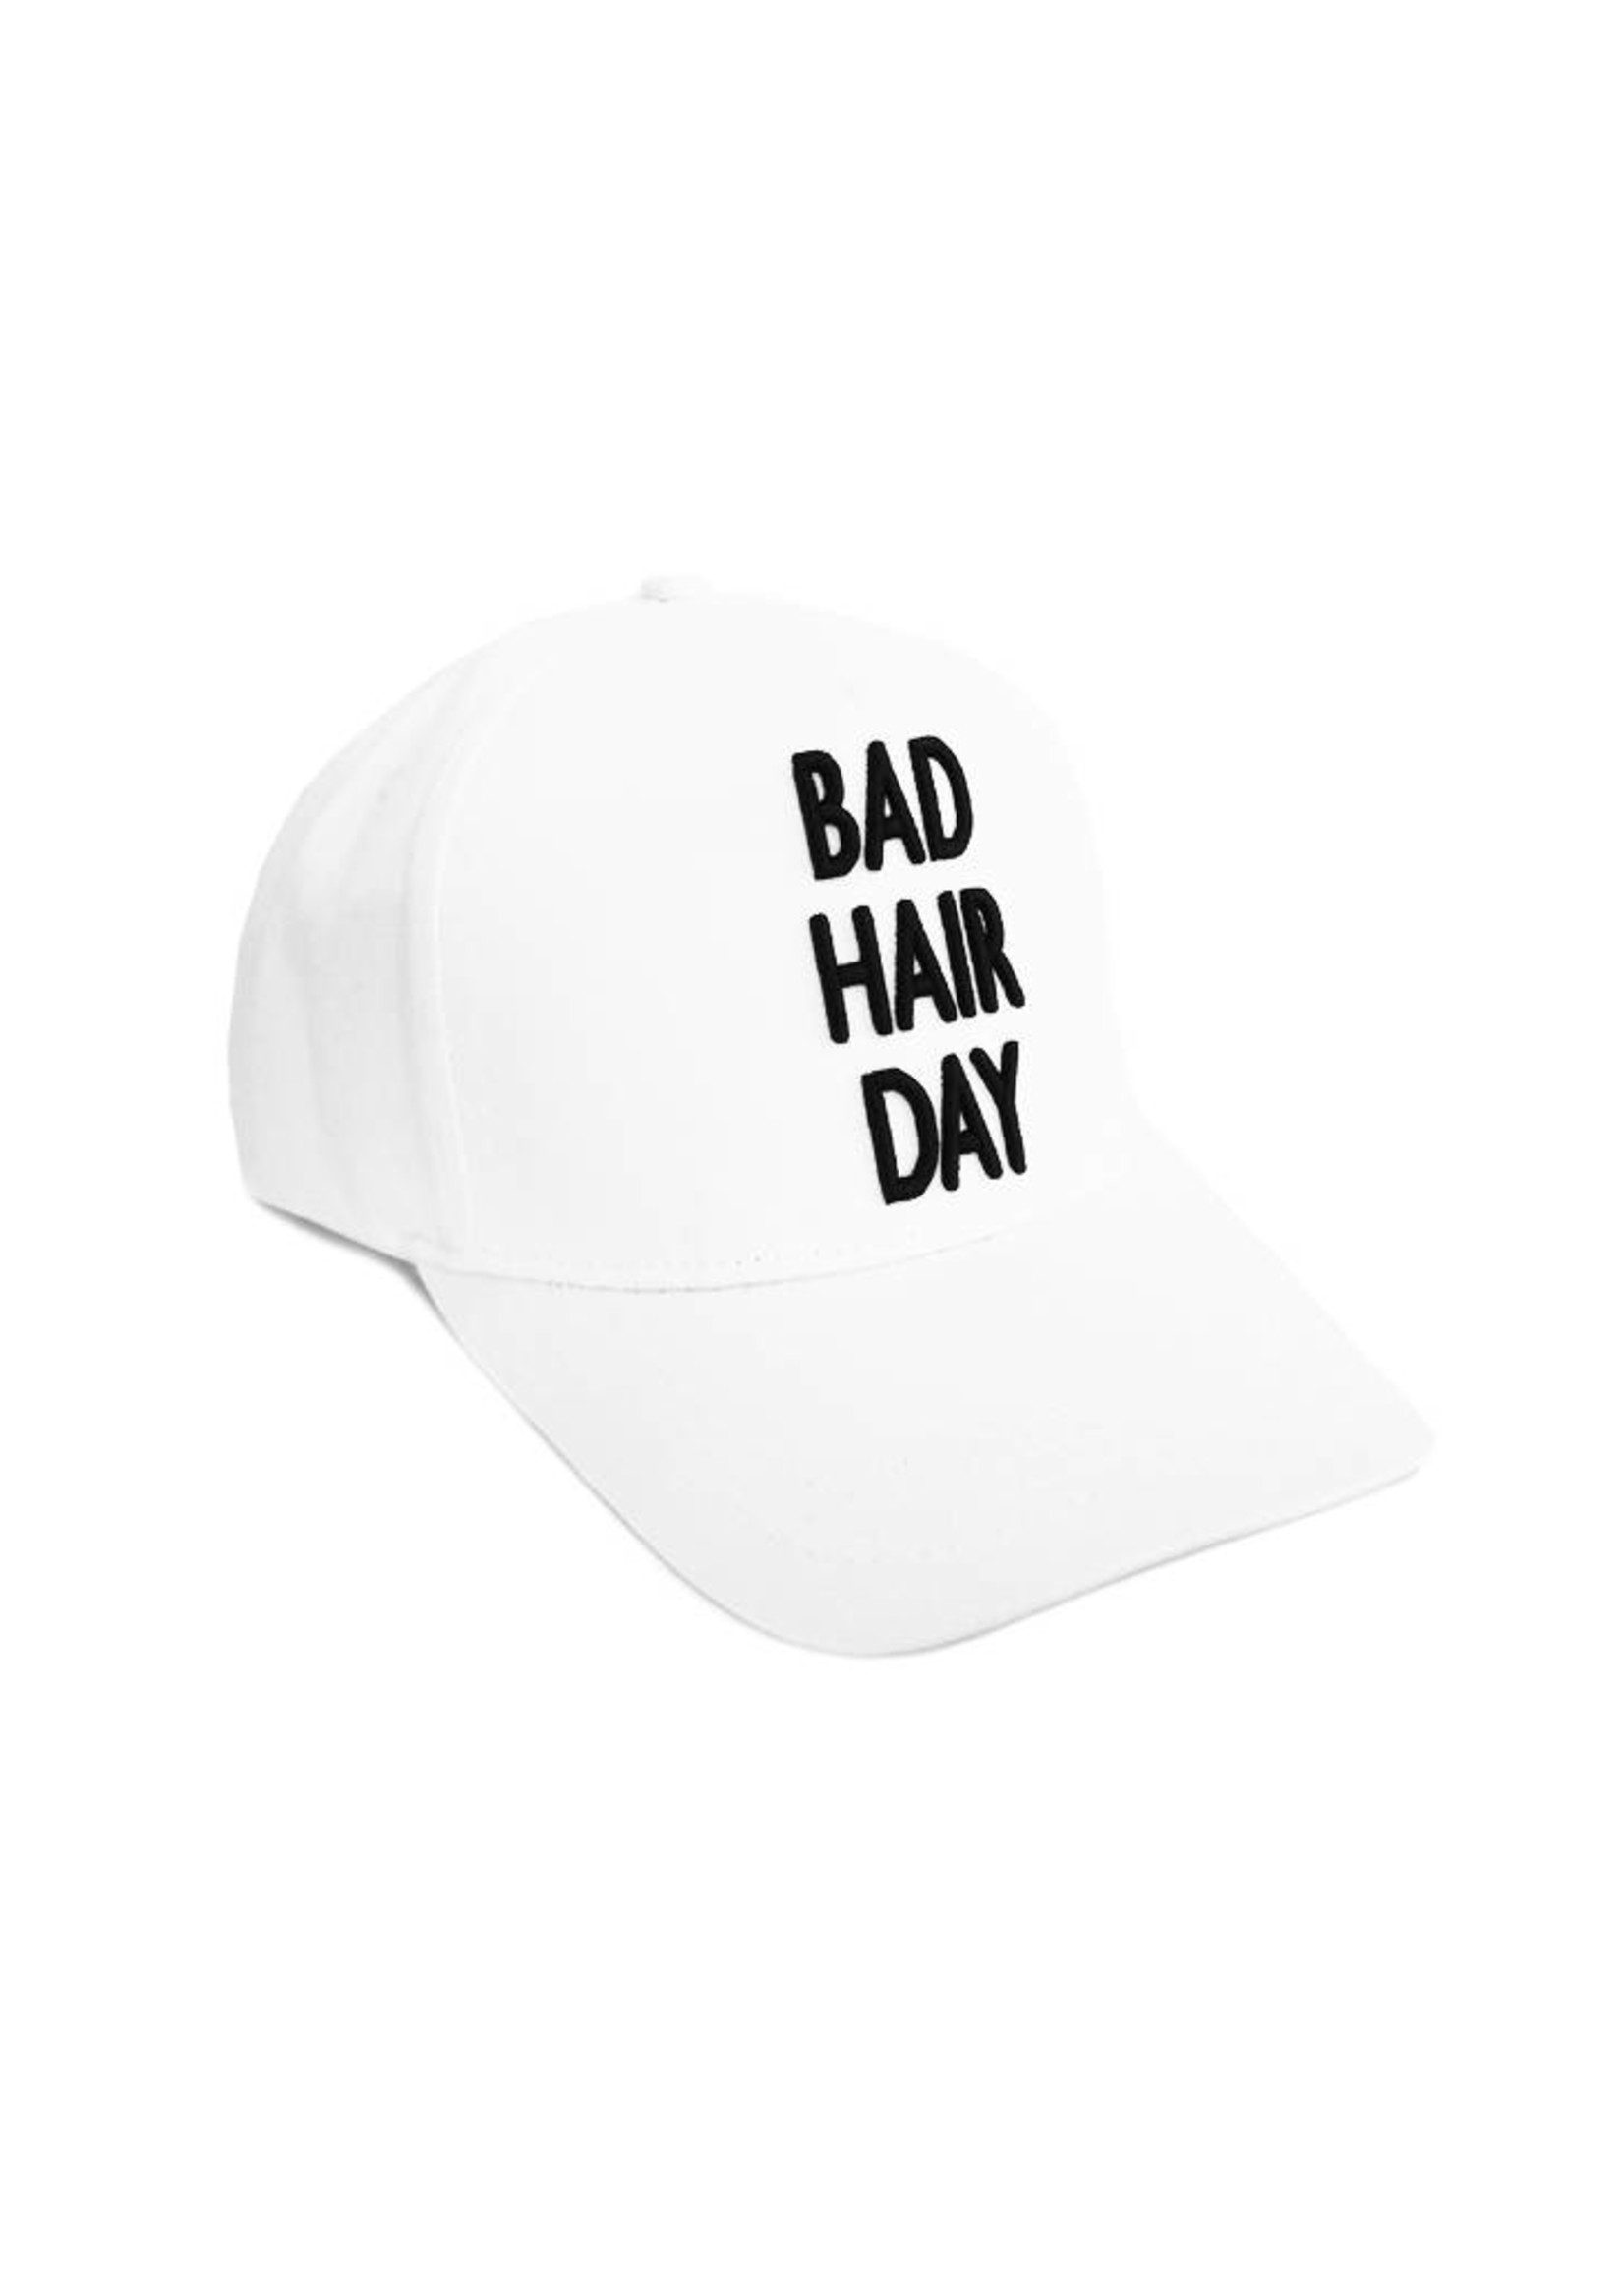 Bad Hair Day - white